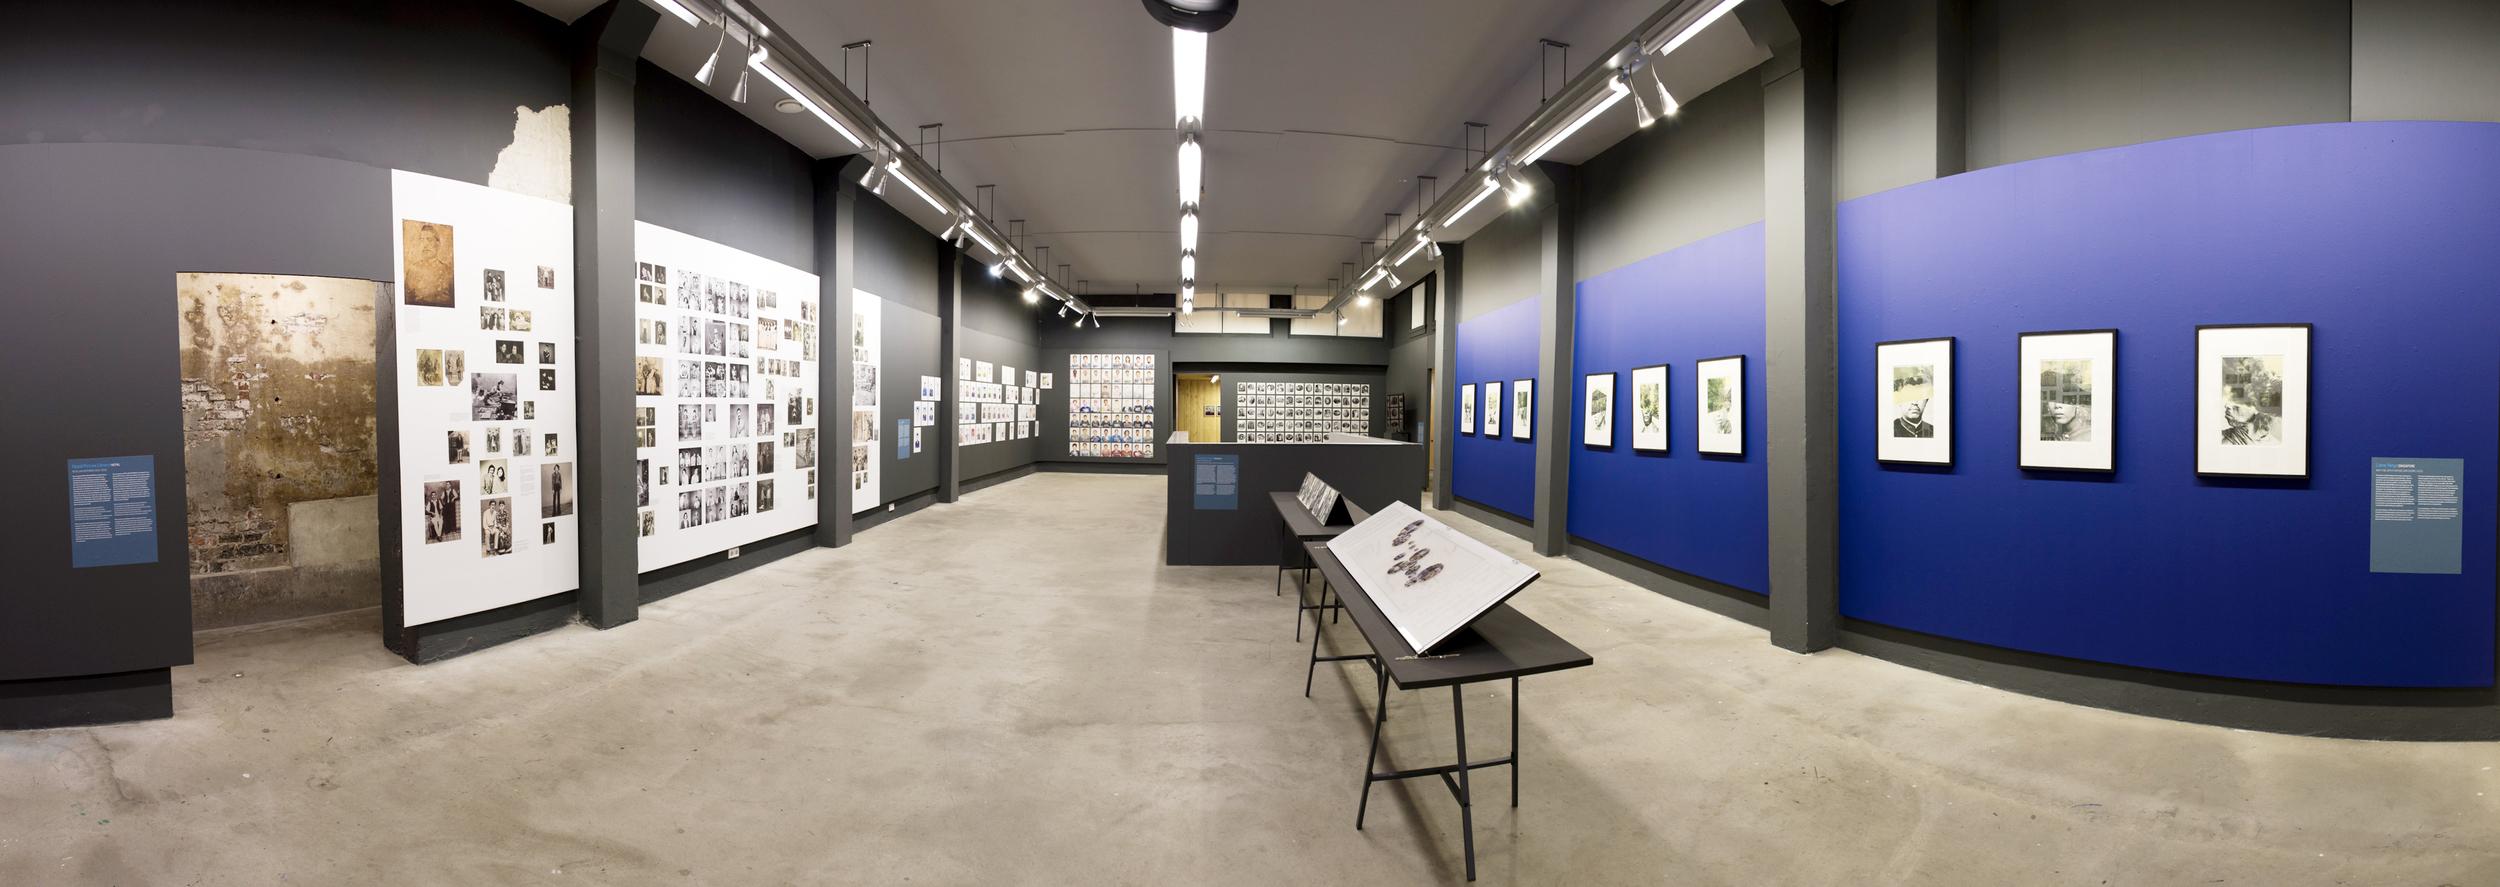 "Post-colonial Photo Studio, Curated by Alex Supartono @ ""Making Oneself"", Noorderlicht Festival 2015"